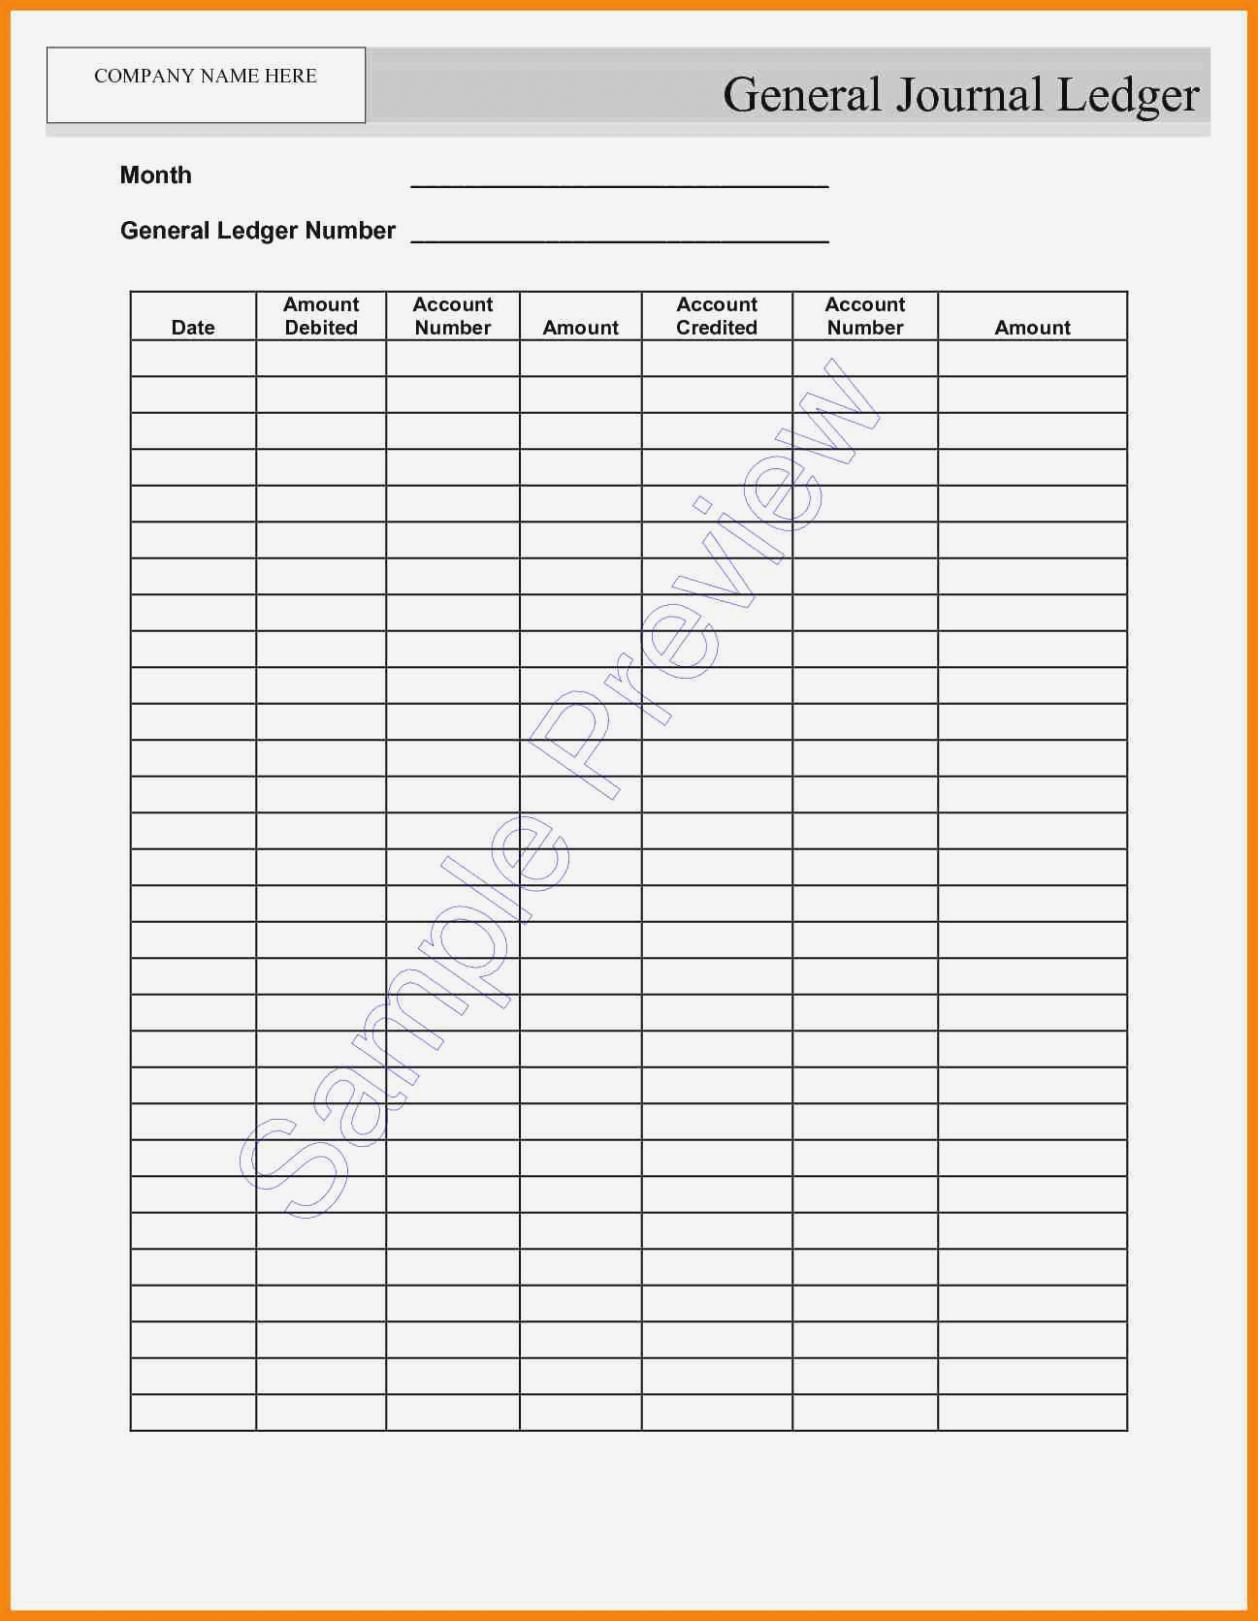 Blank Self Employment Ledger Template Excel For Self Employment Ledger Template Excel Document